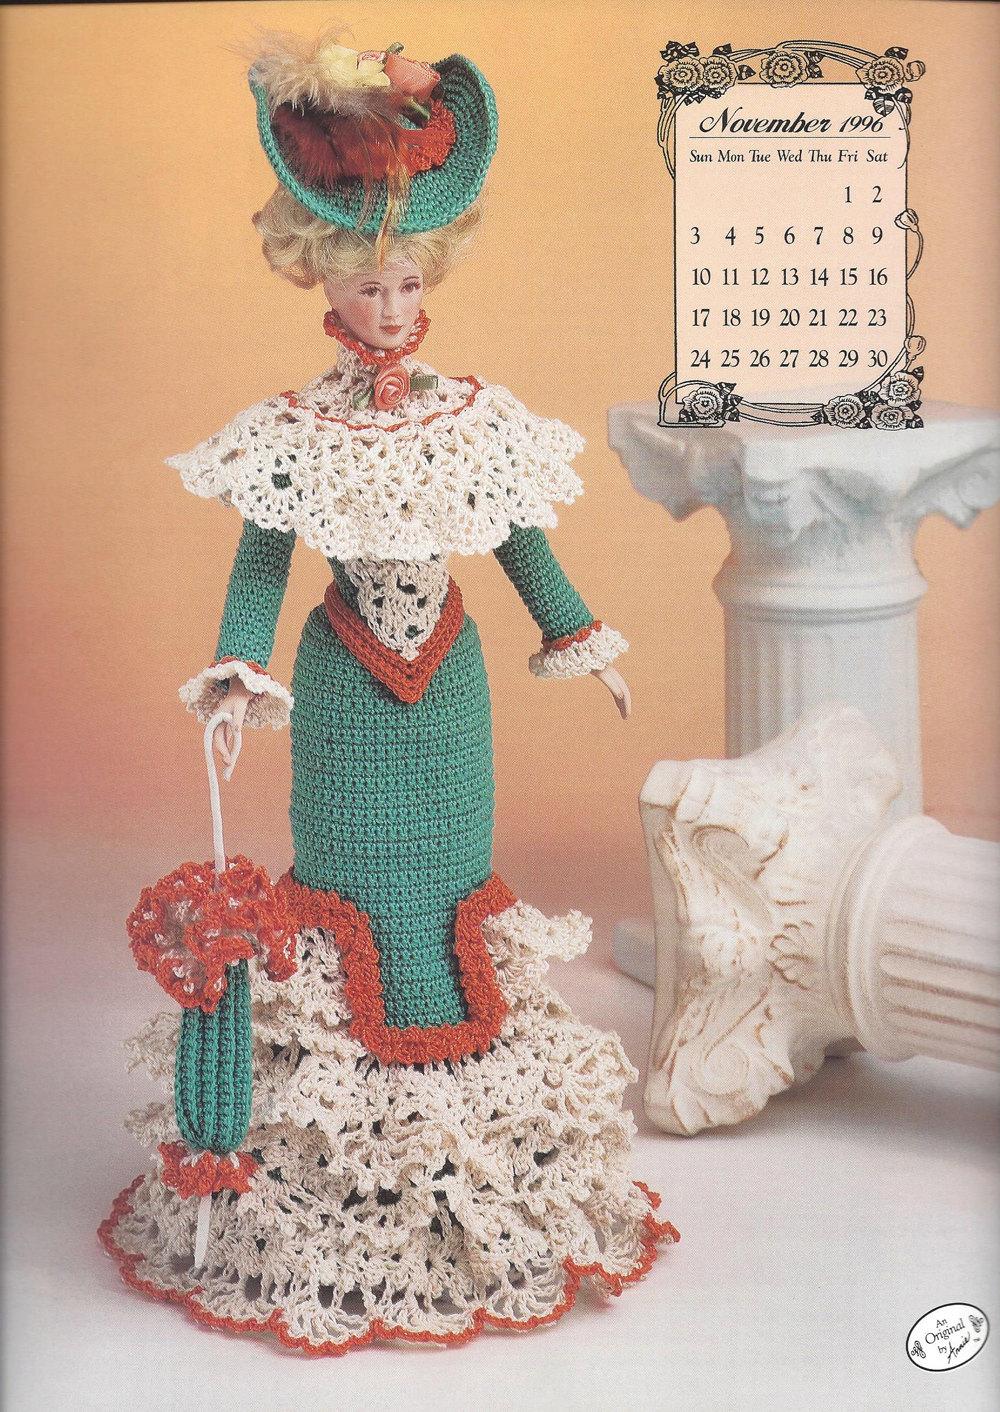 Miss November 1996 Promenade Costume Crochet Pattern Annies